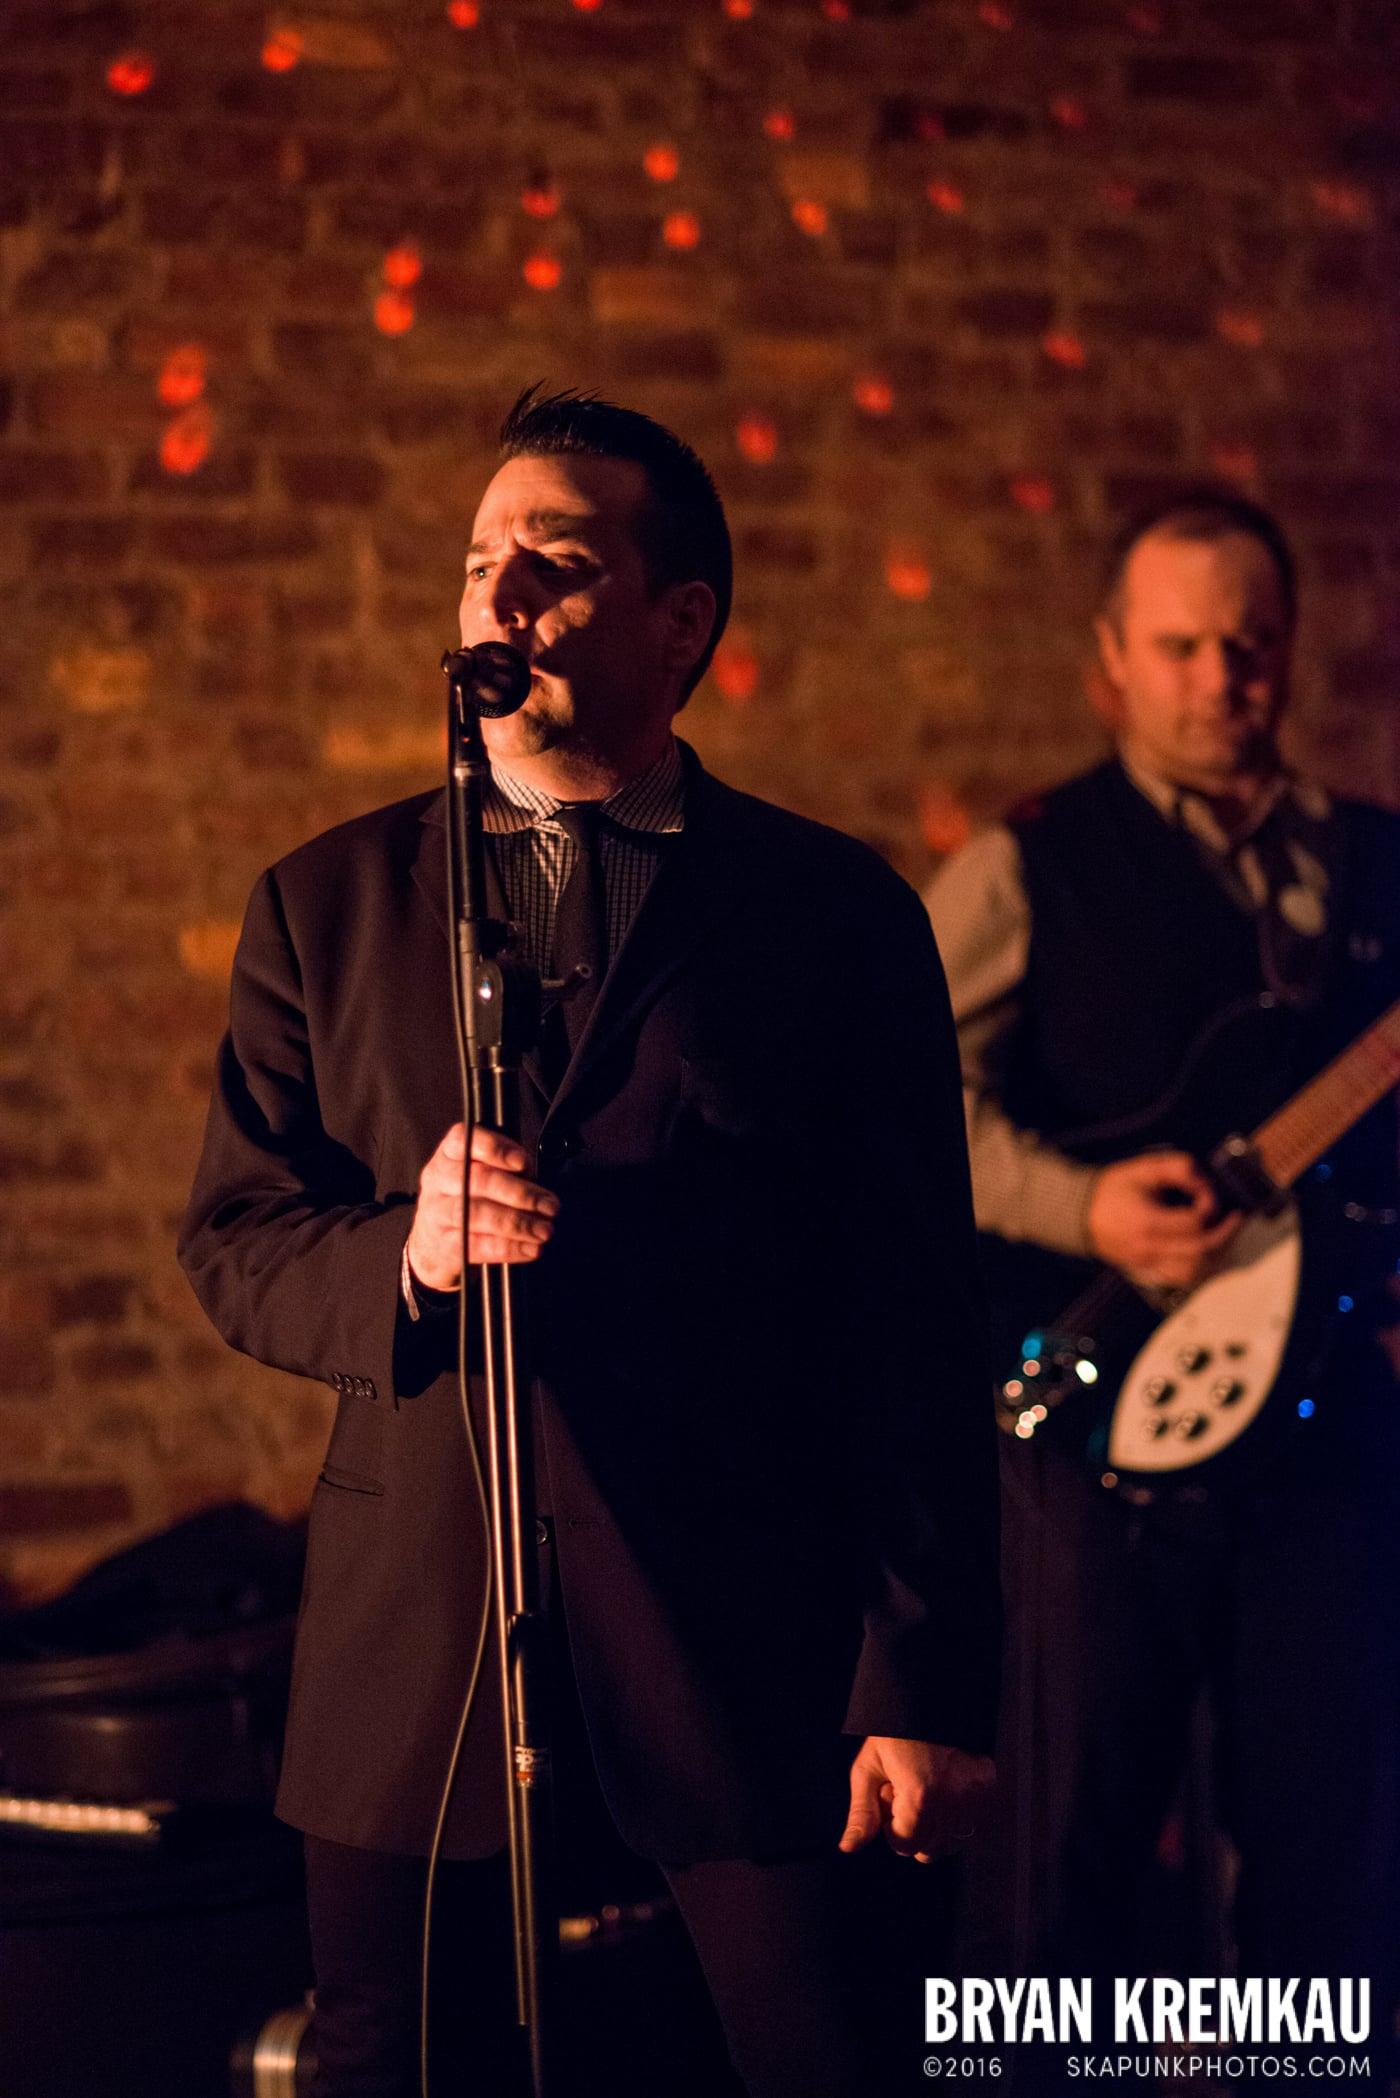 Rude Boy George @ Characters, NYC - 11.16.13 (23)